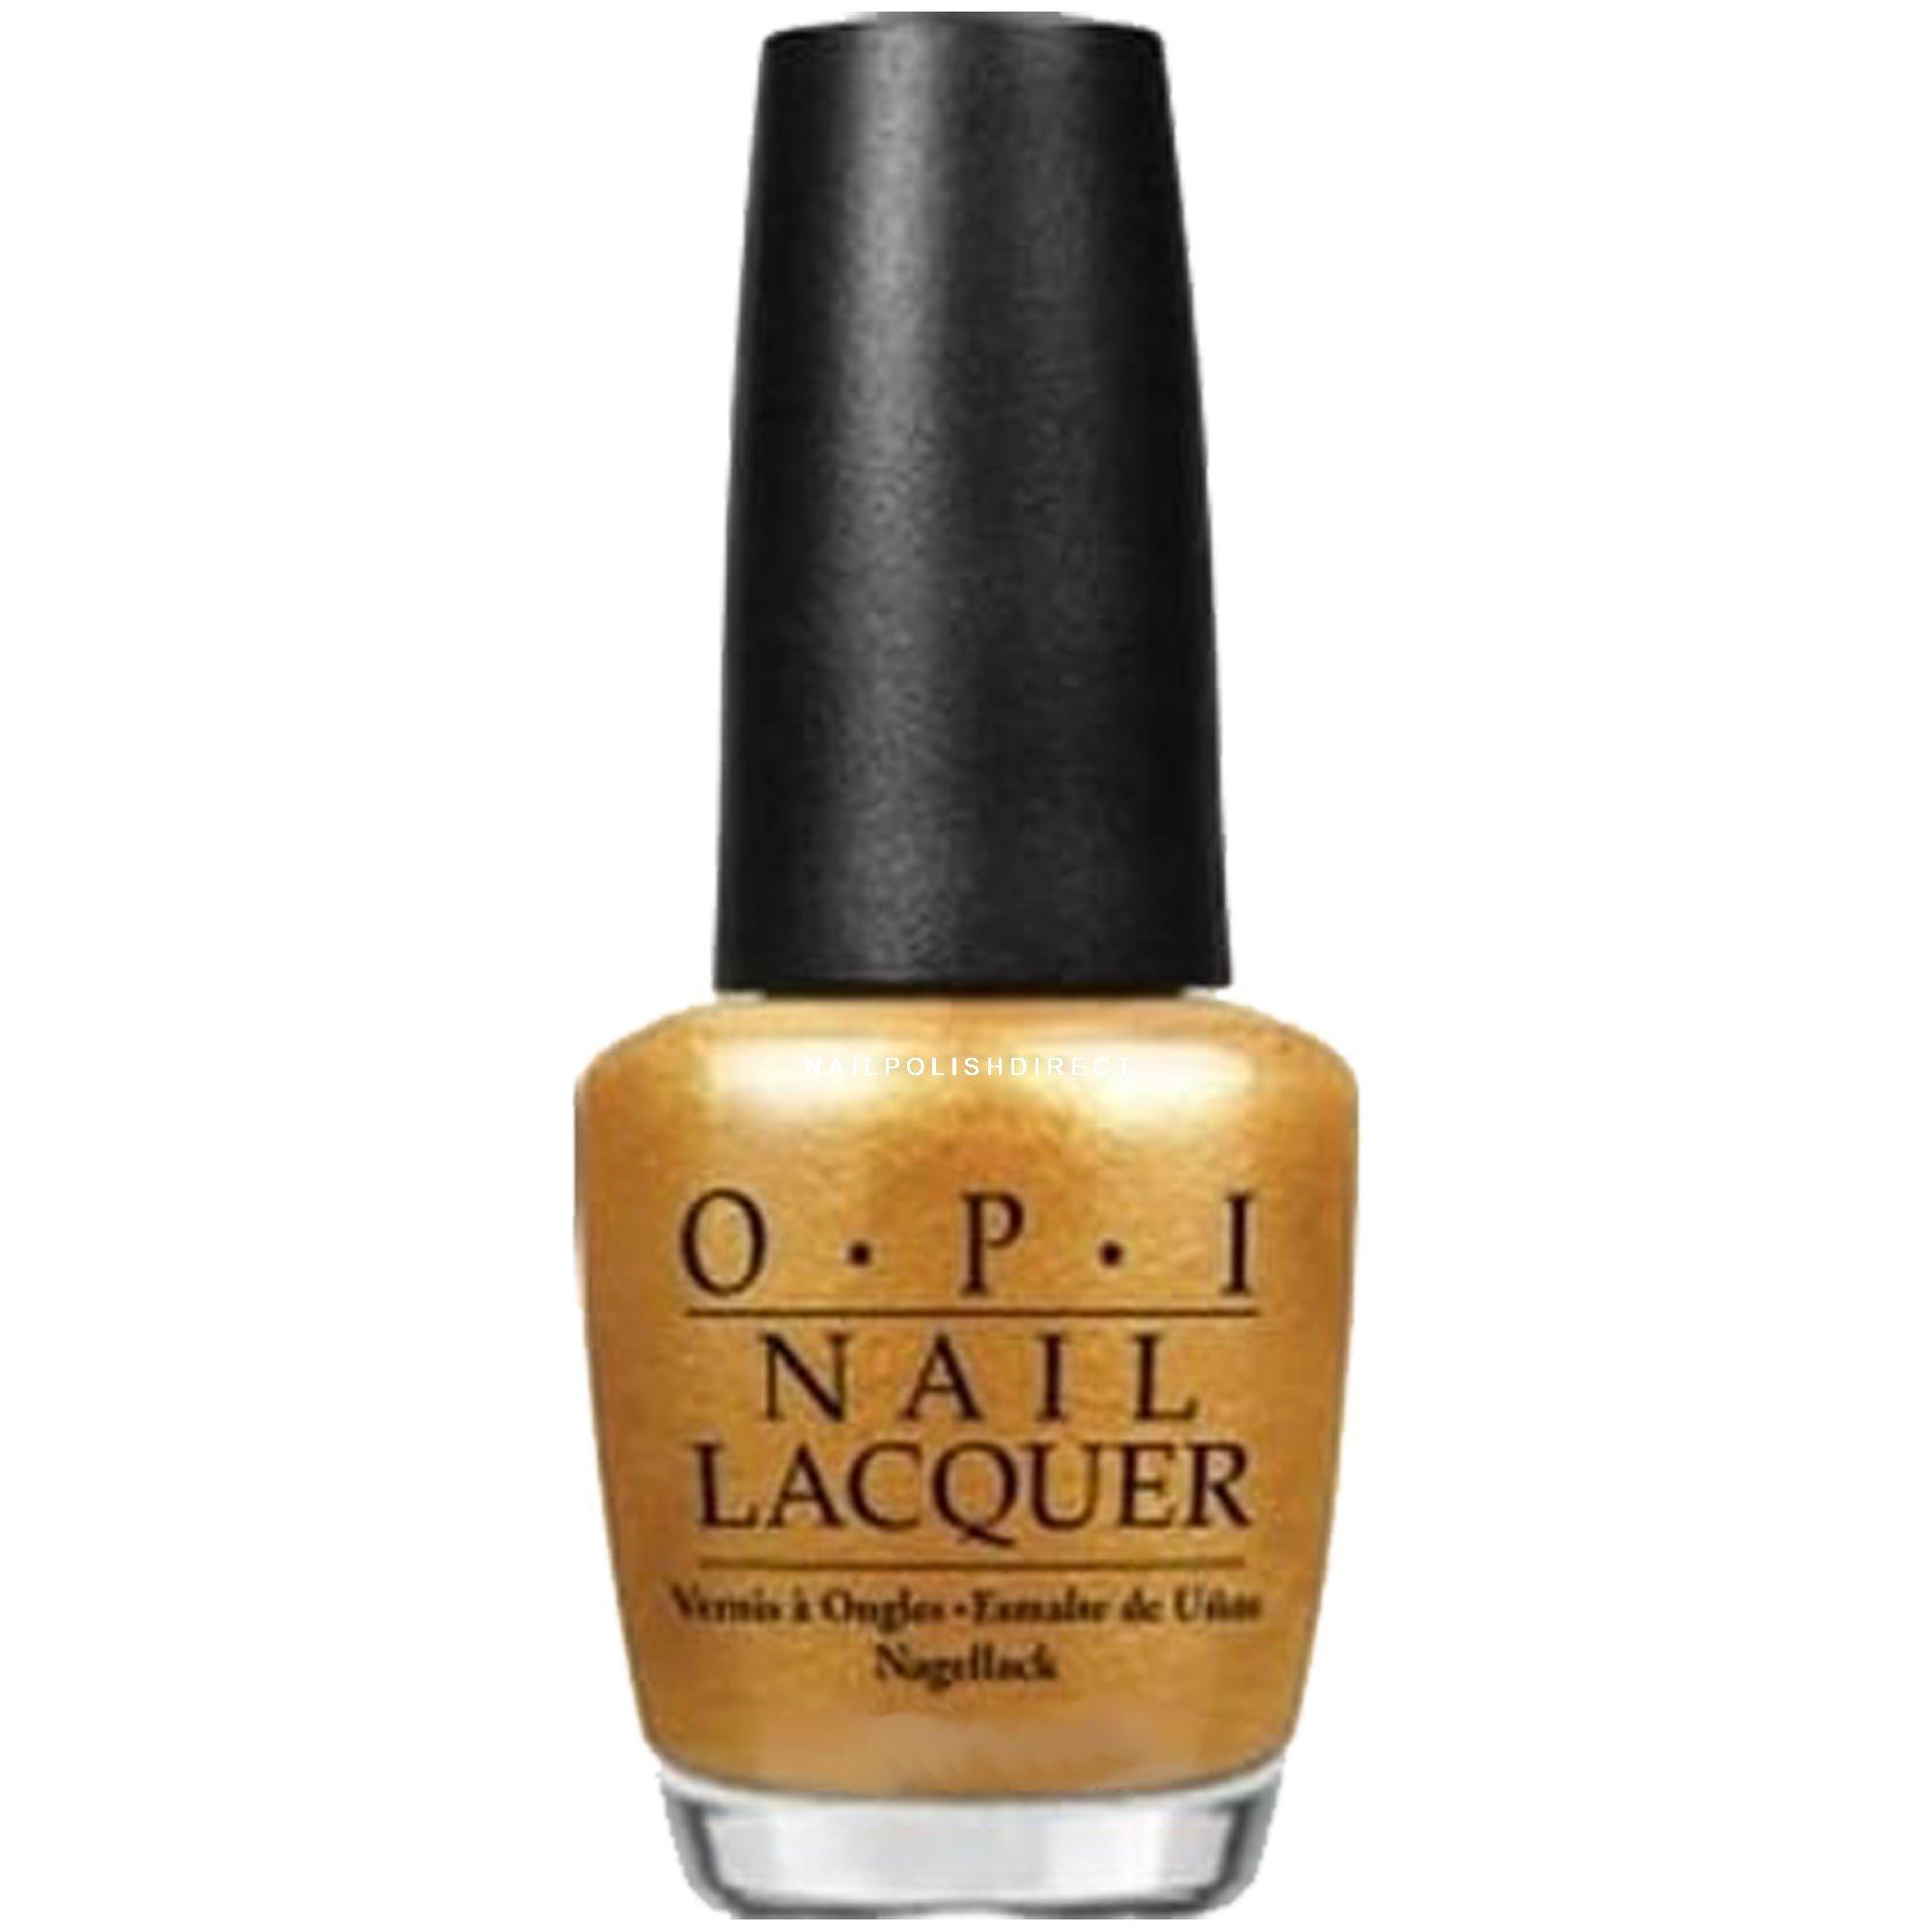 Gold Nail Polish in OPI, Jessica, China Glaze, Essie & Progel